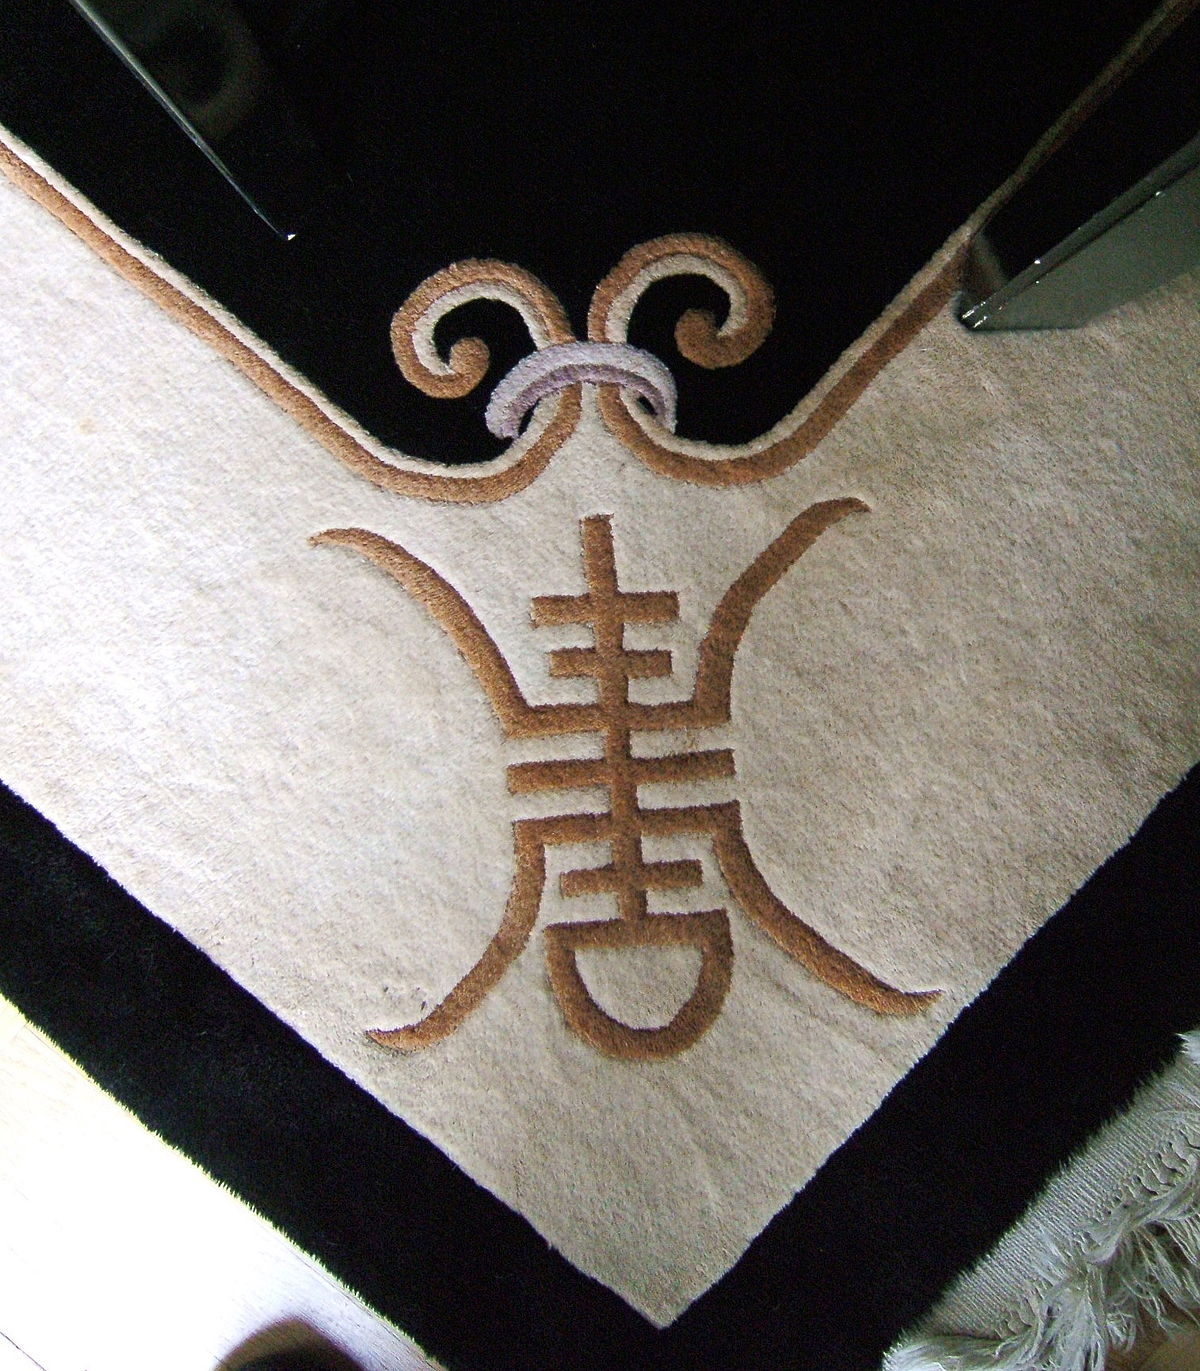 Shou Character Wikipedia